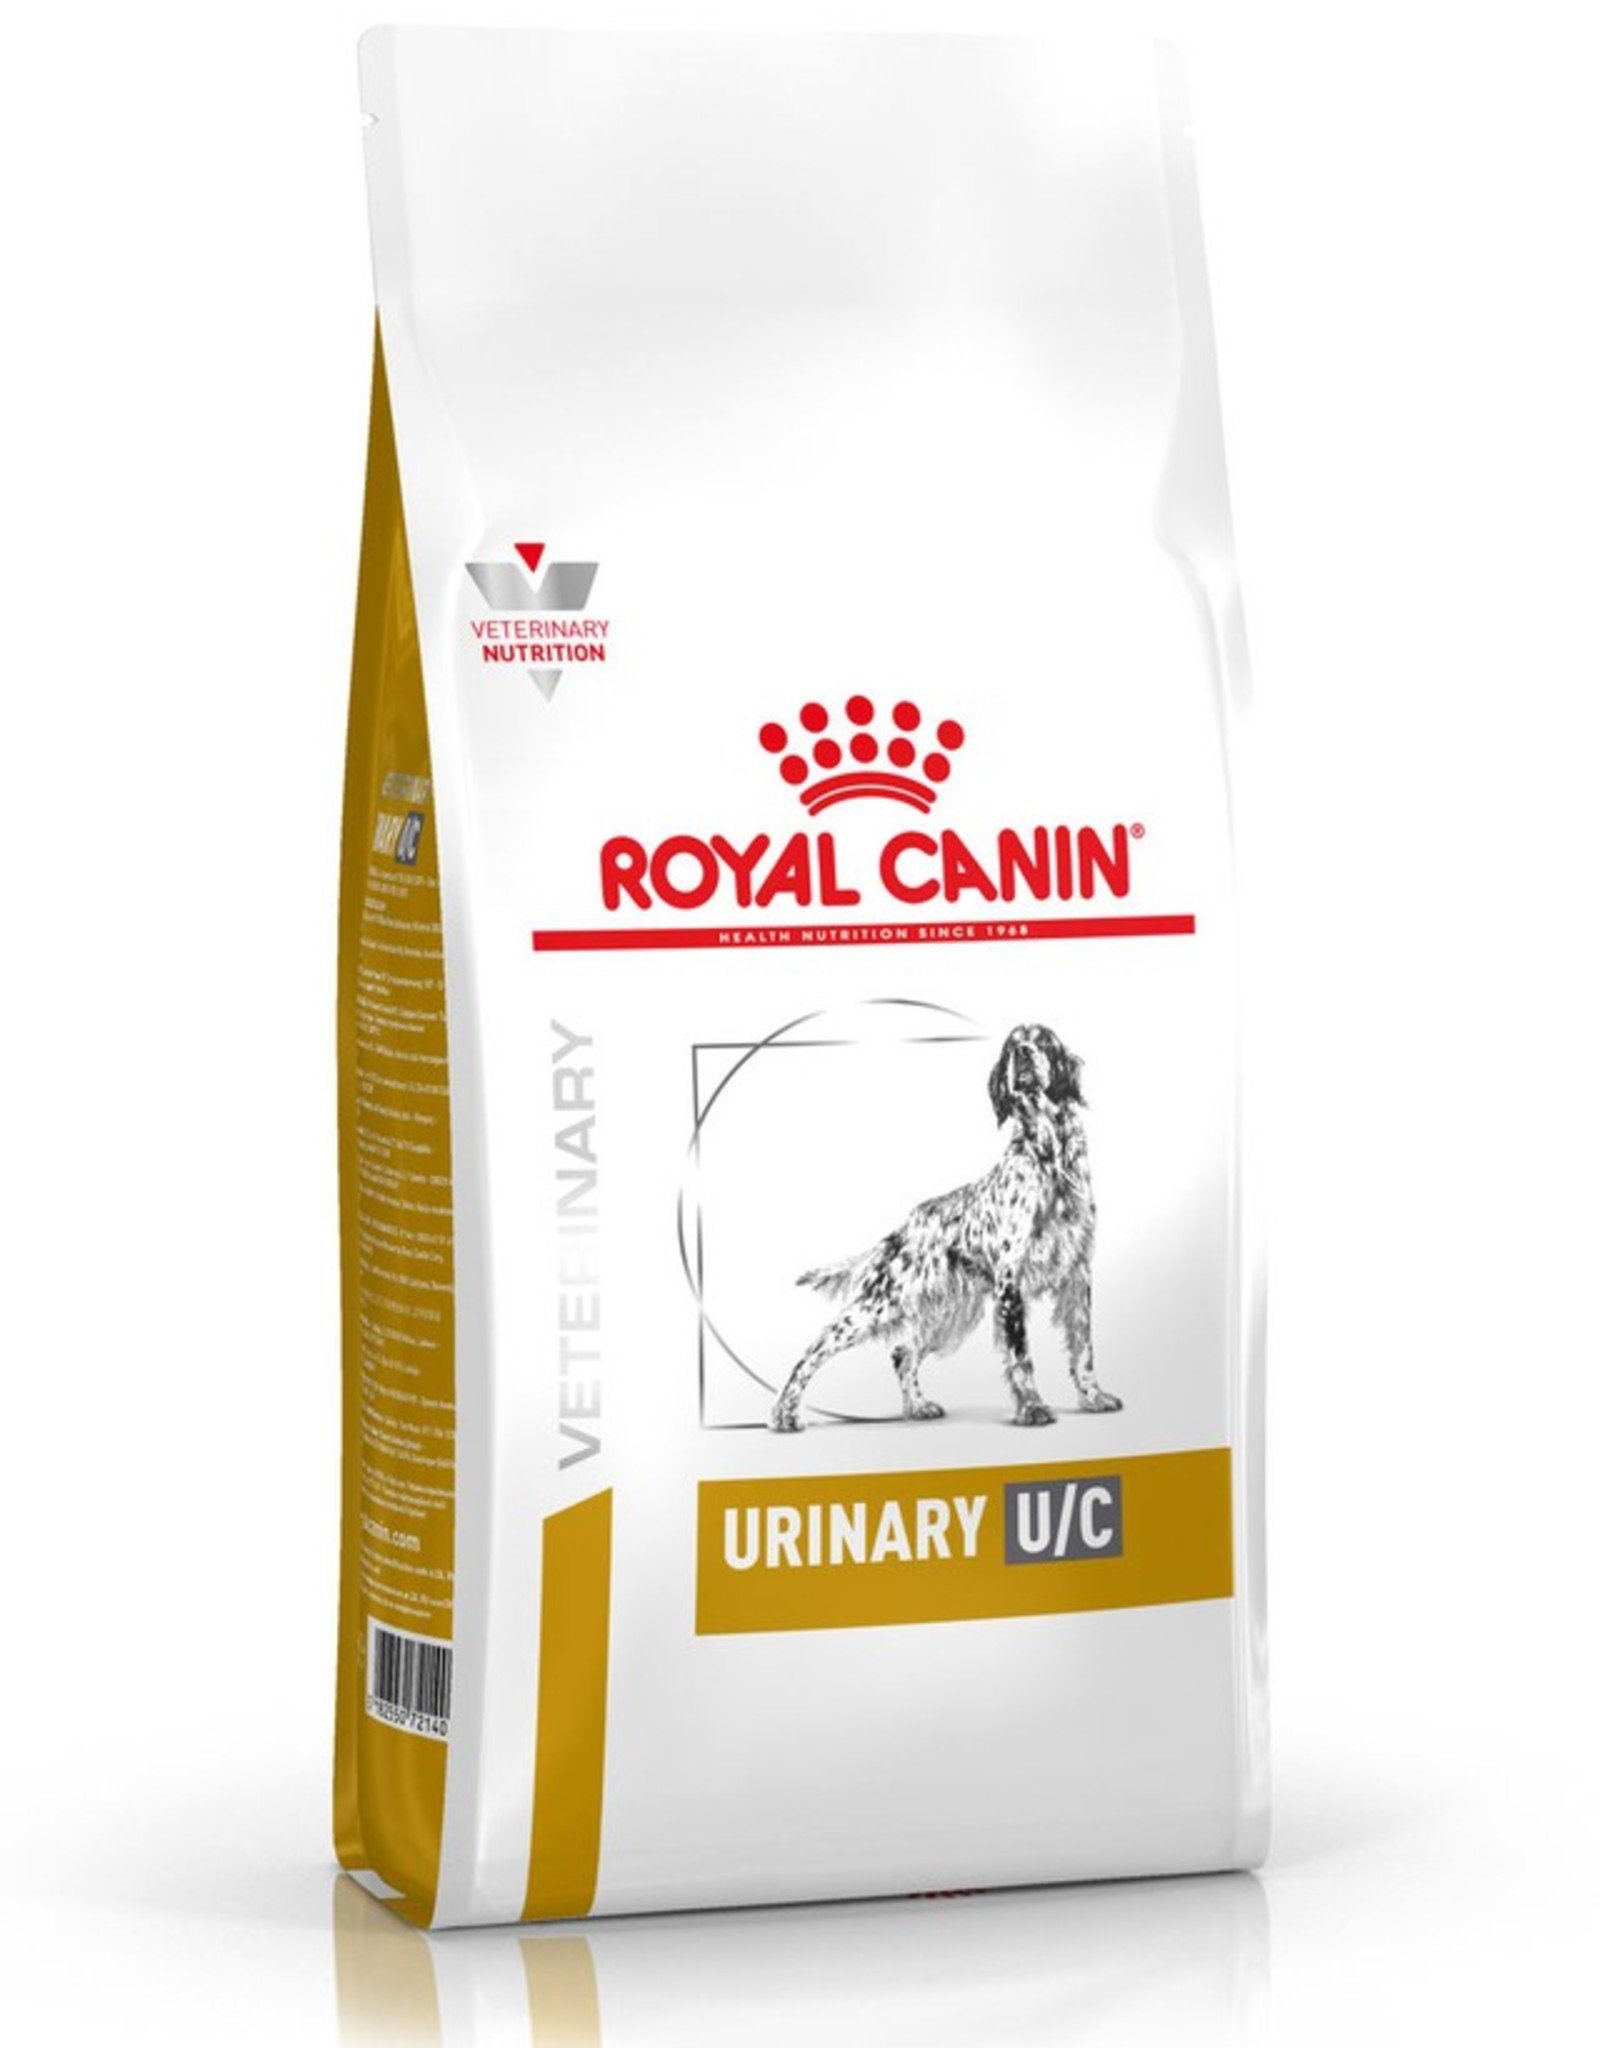 Royal Canin Royal Canin Urinary U/c Low Proteine   Hund 14kg